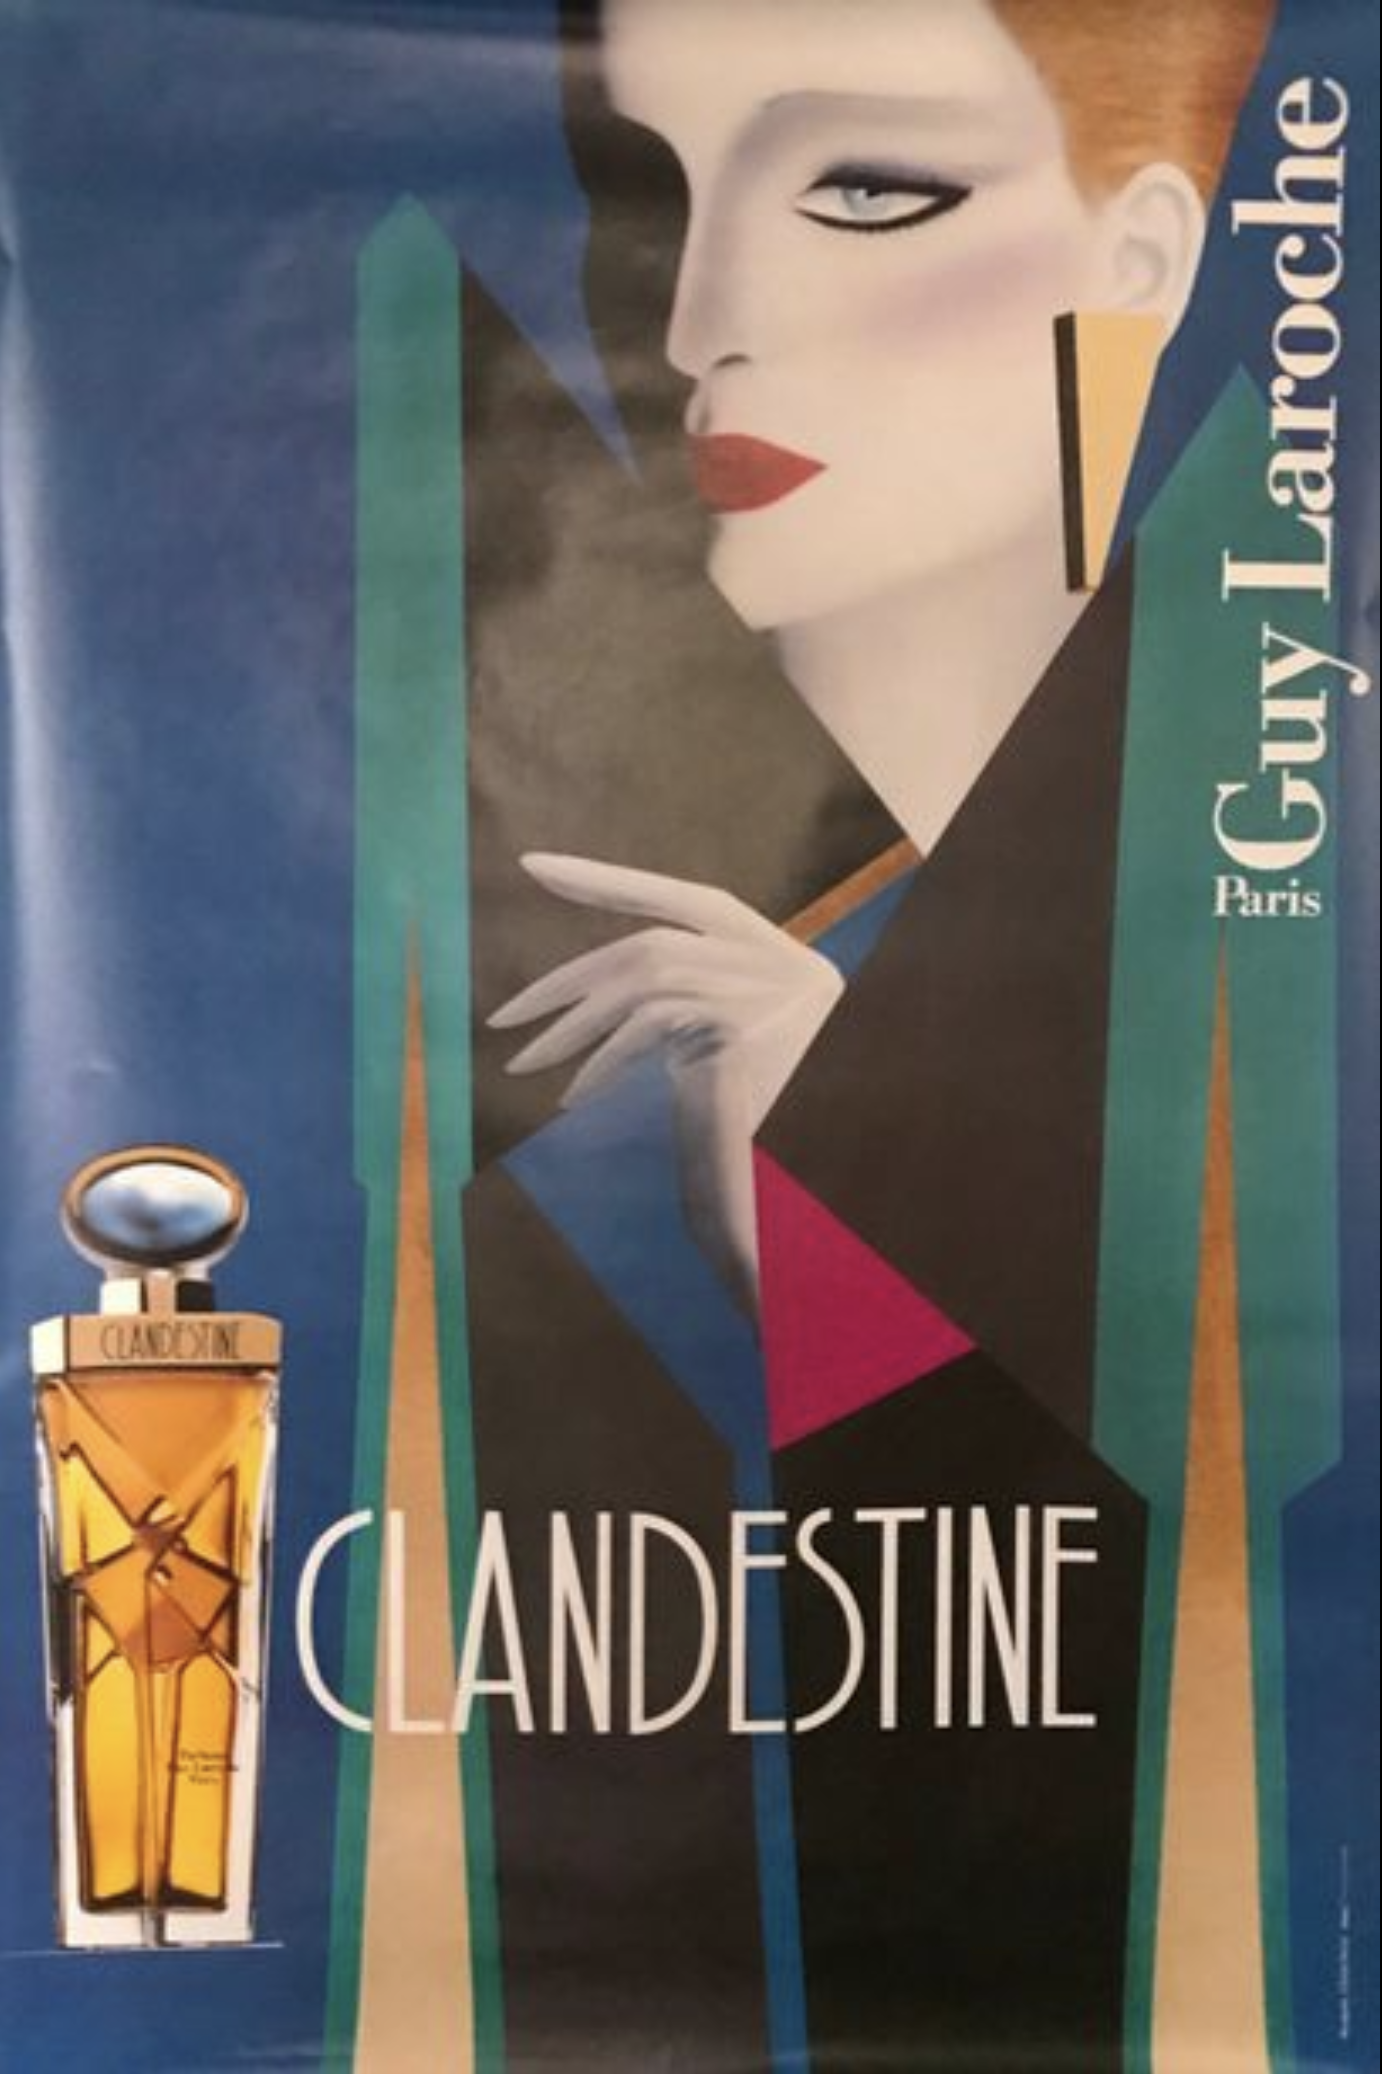 'Clandestine' Guy Laroche Paris Original Vintage Poster